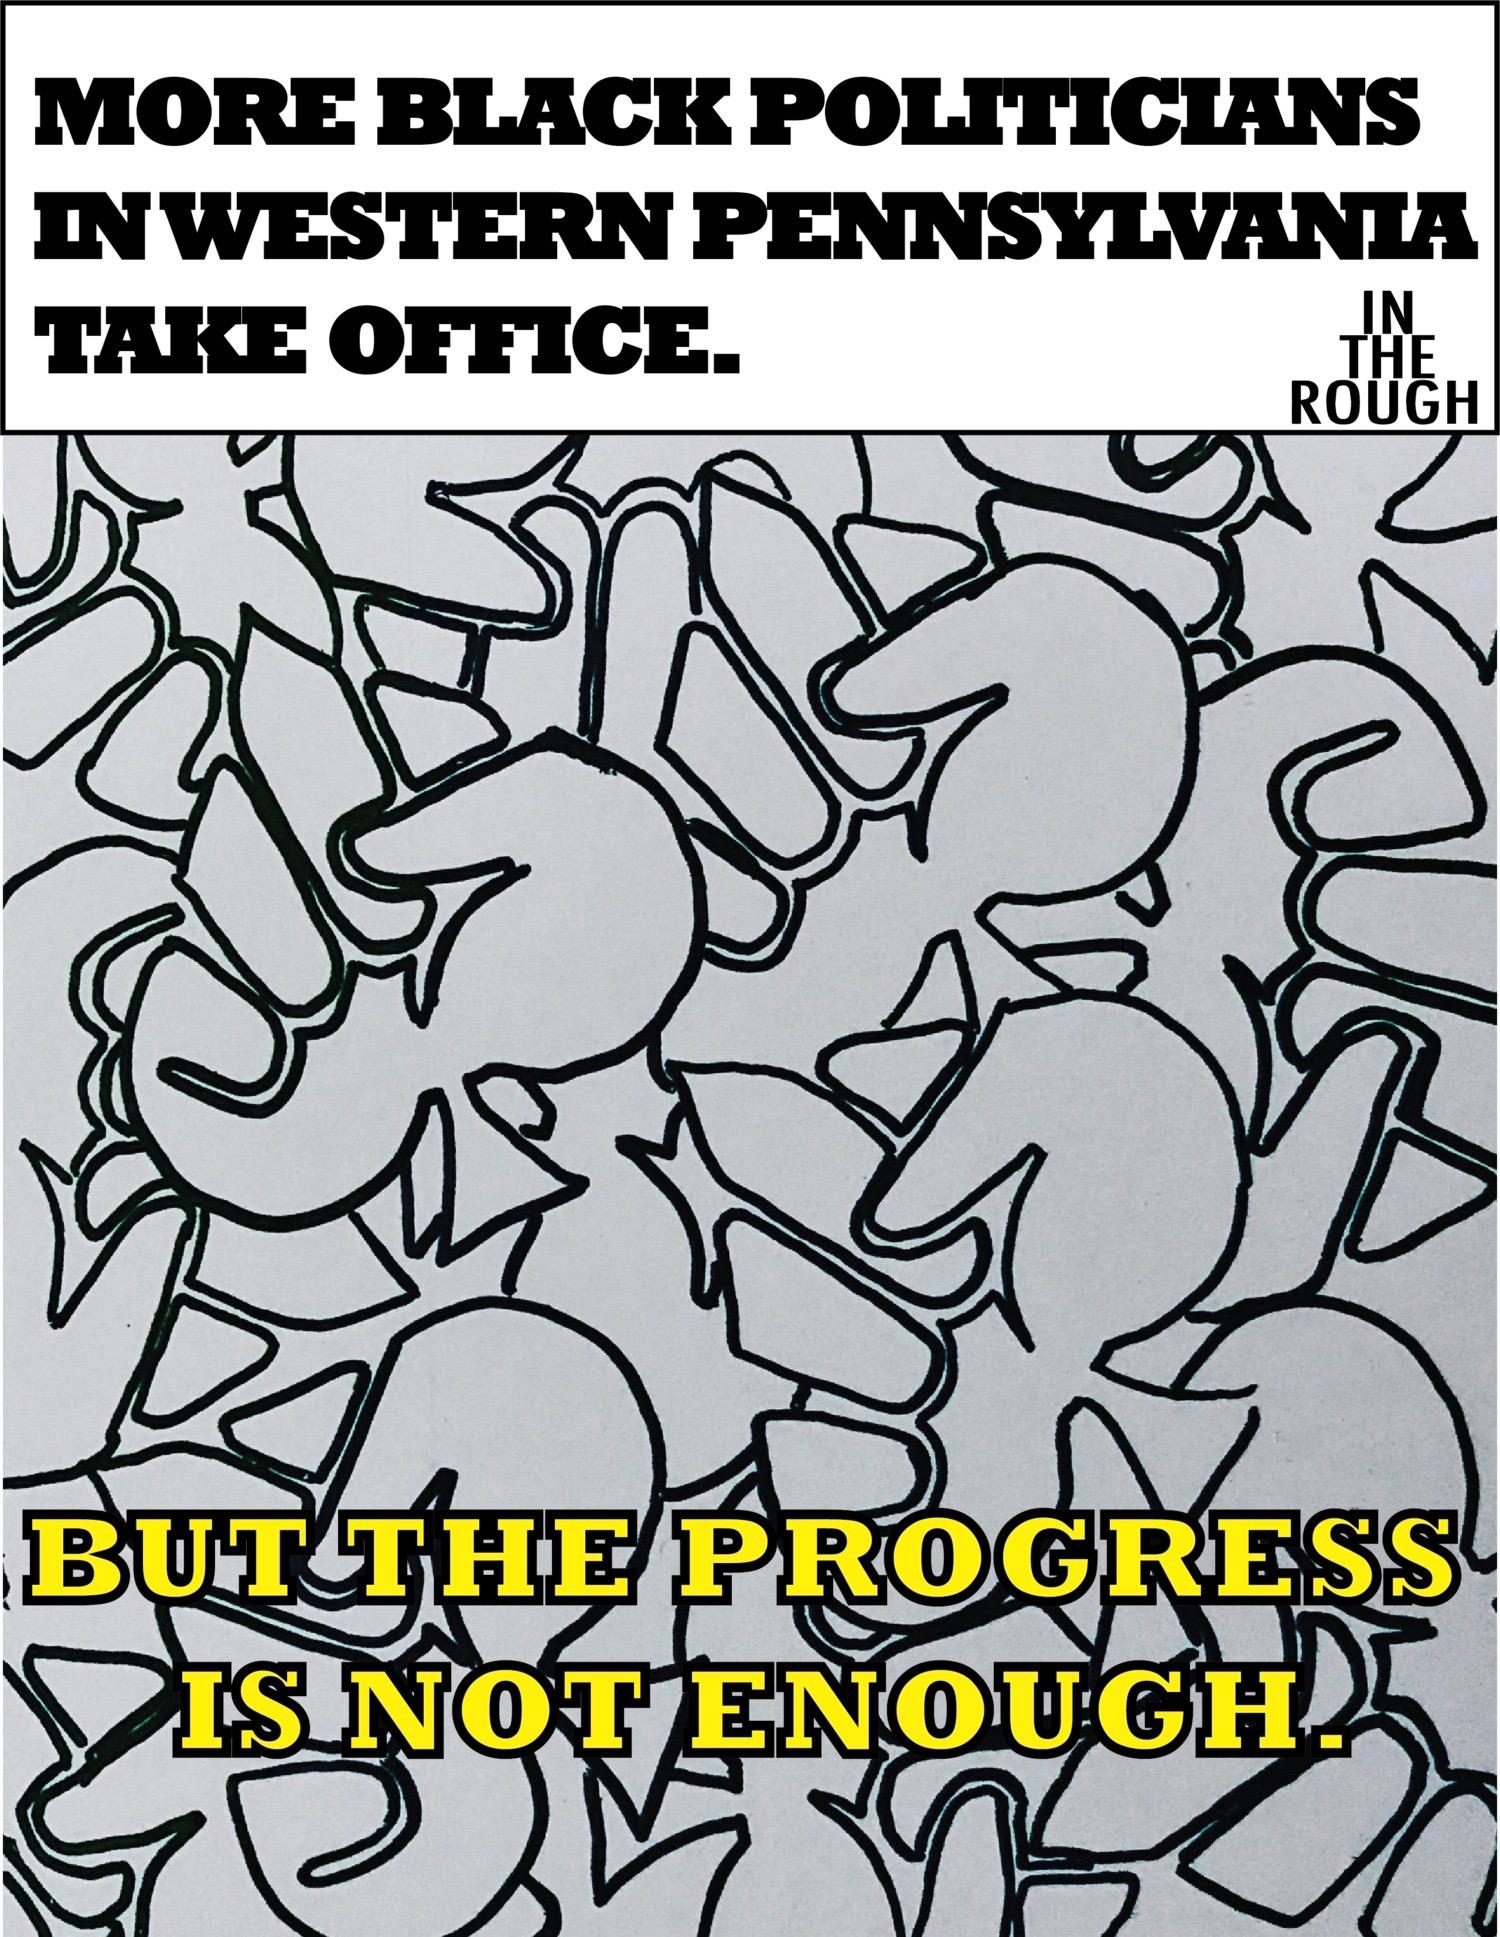 Graphic by Quaishawn Whitlock